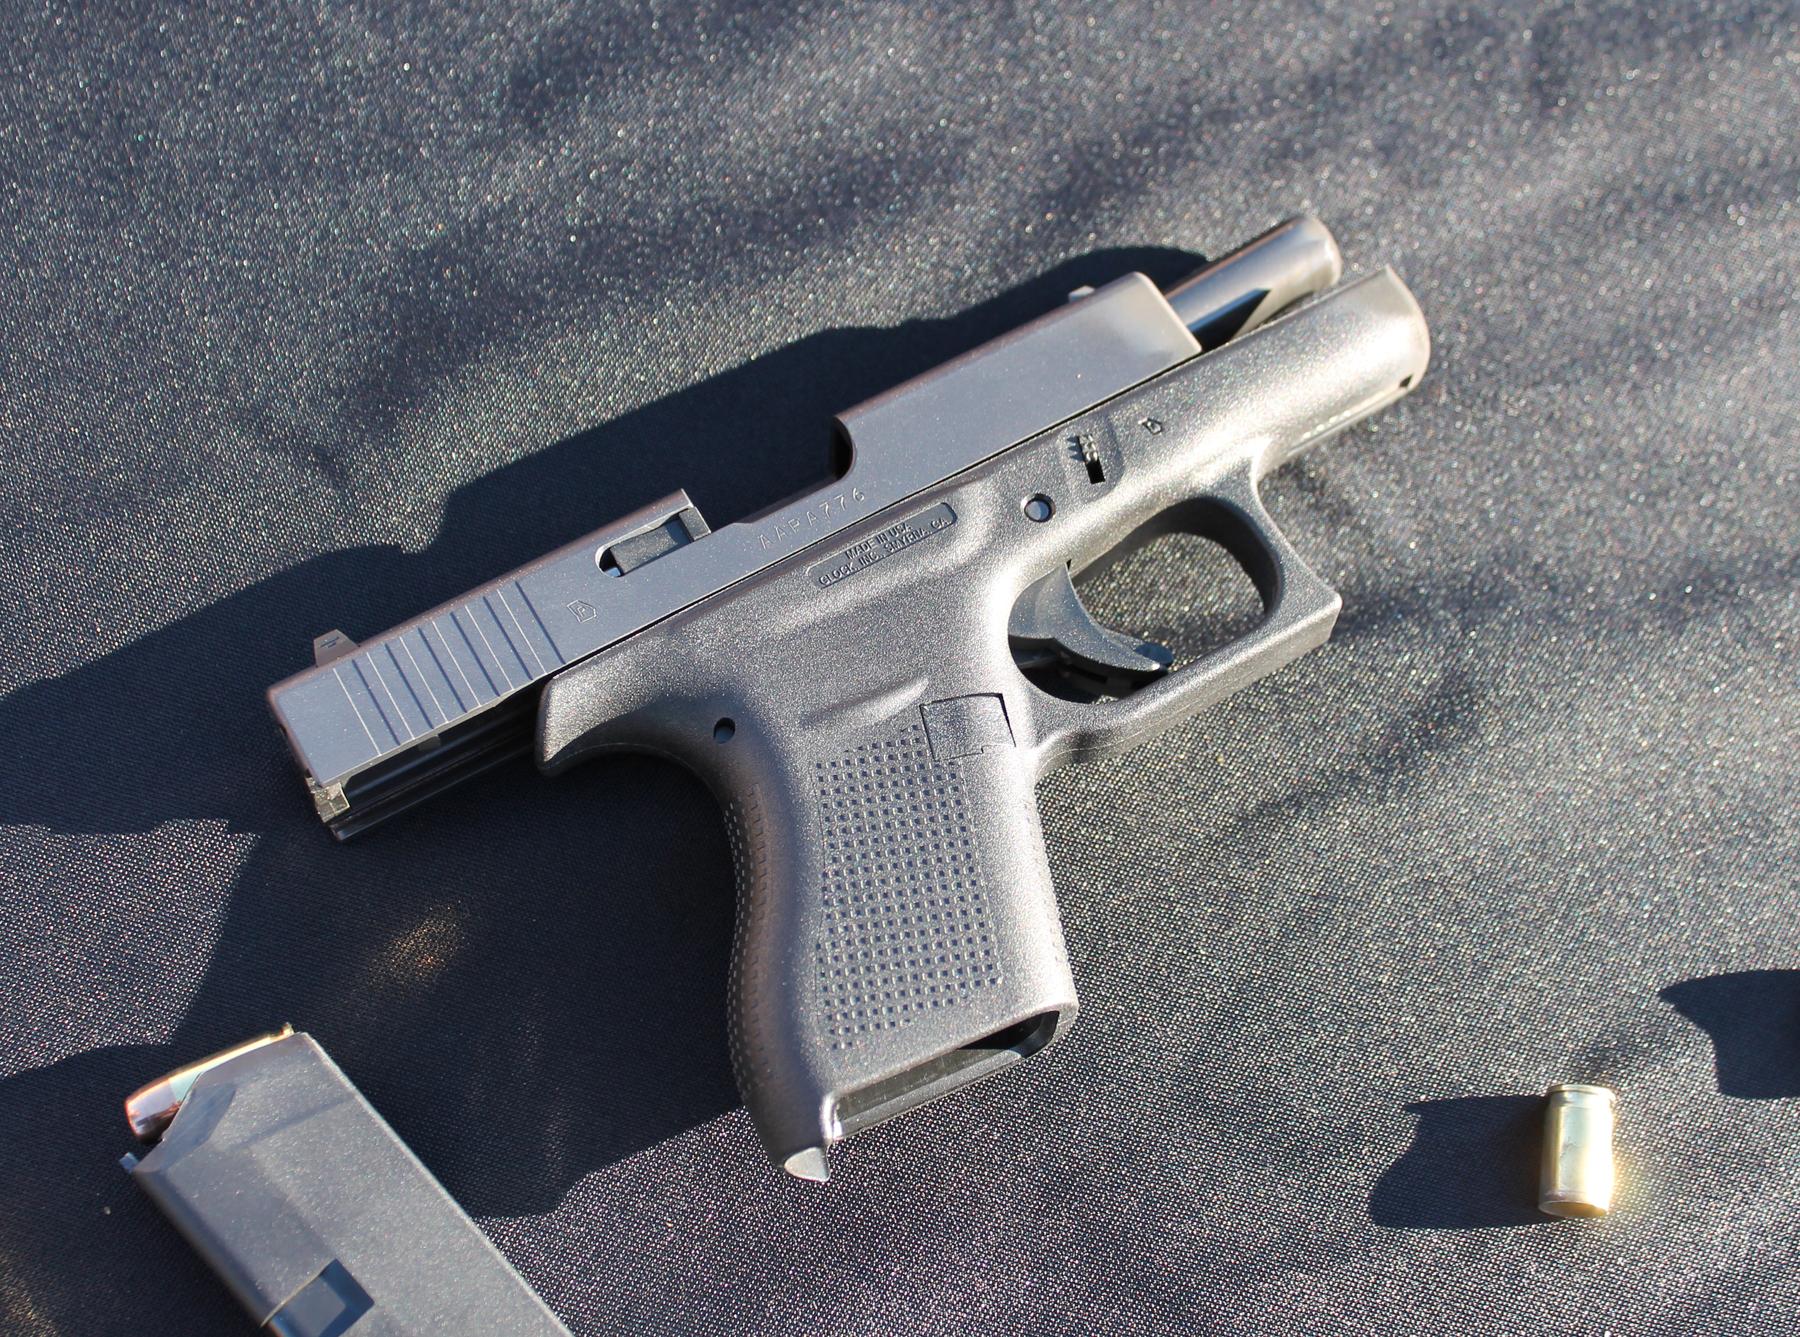 Glock 42 slidelock